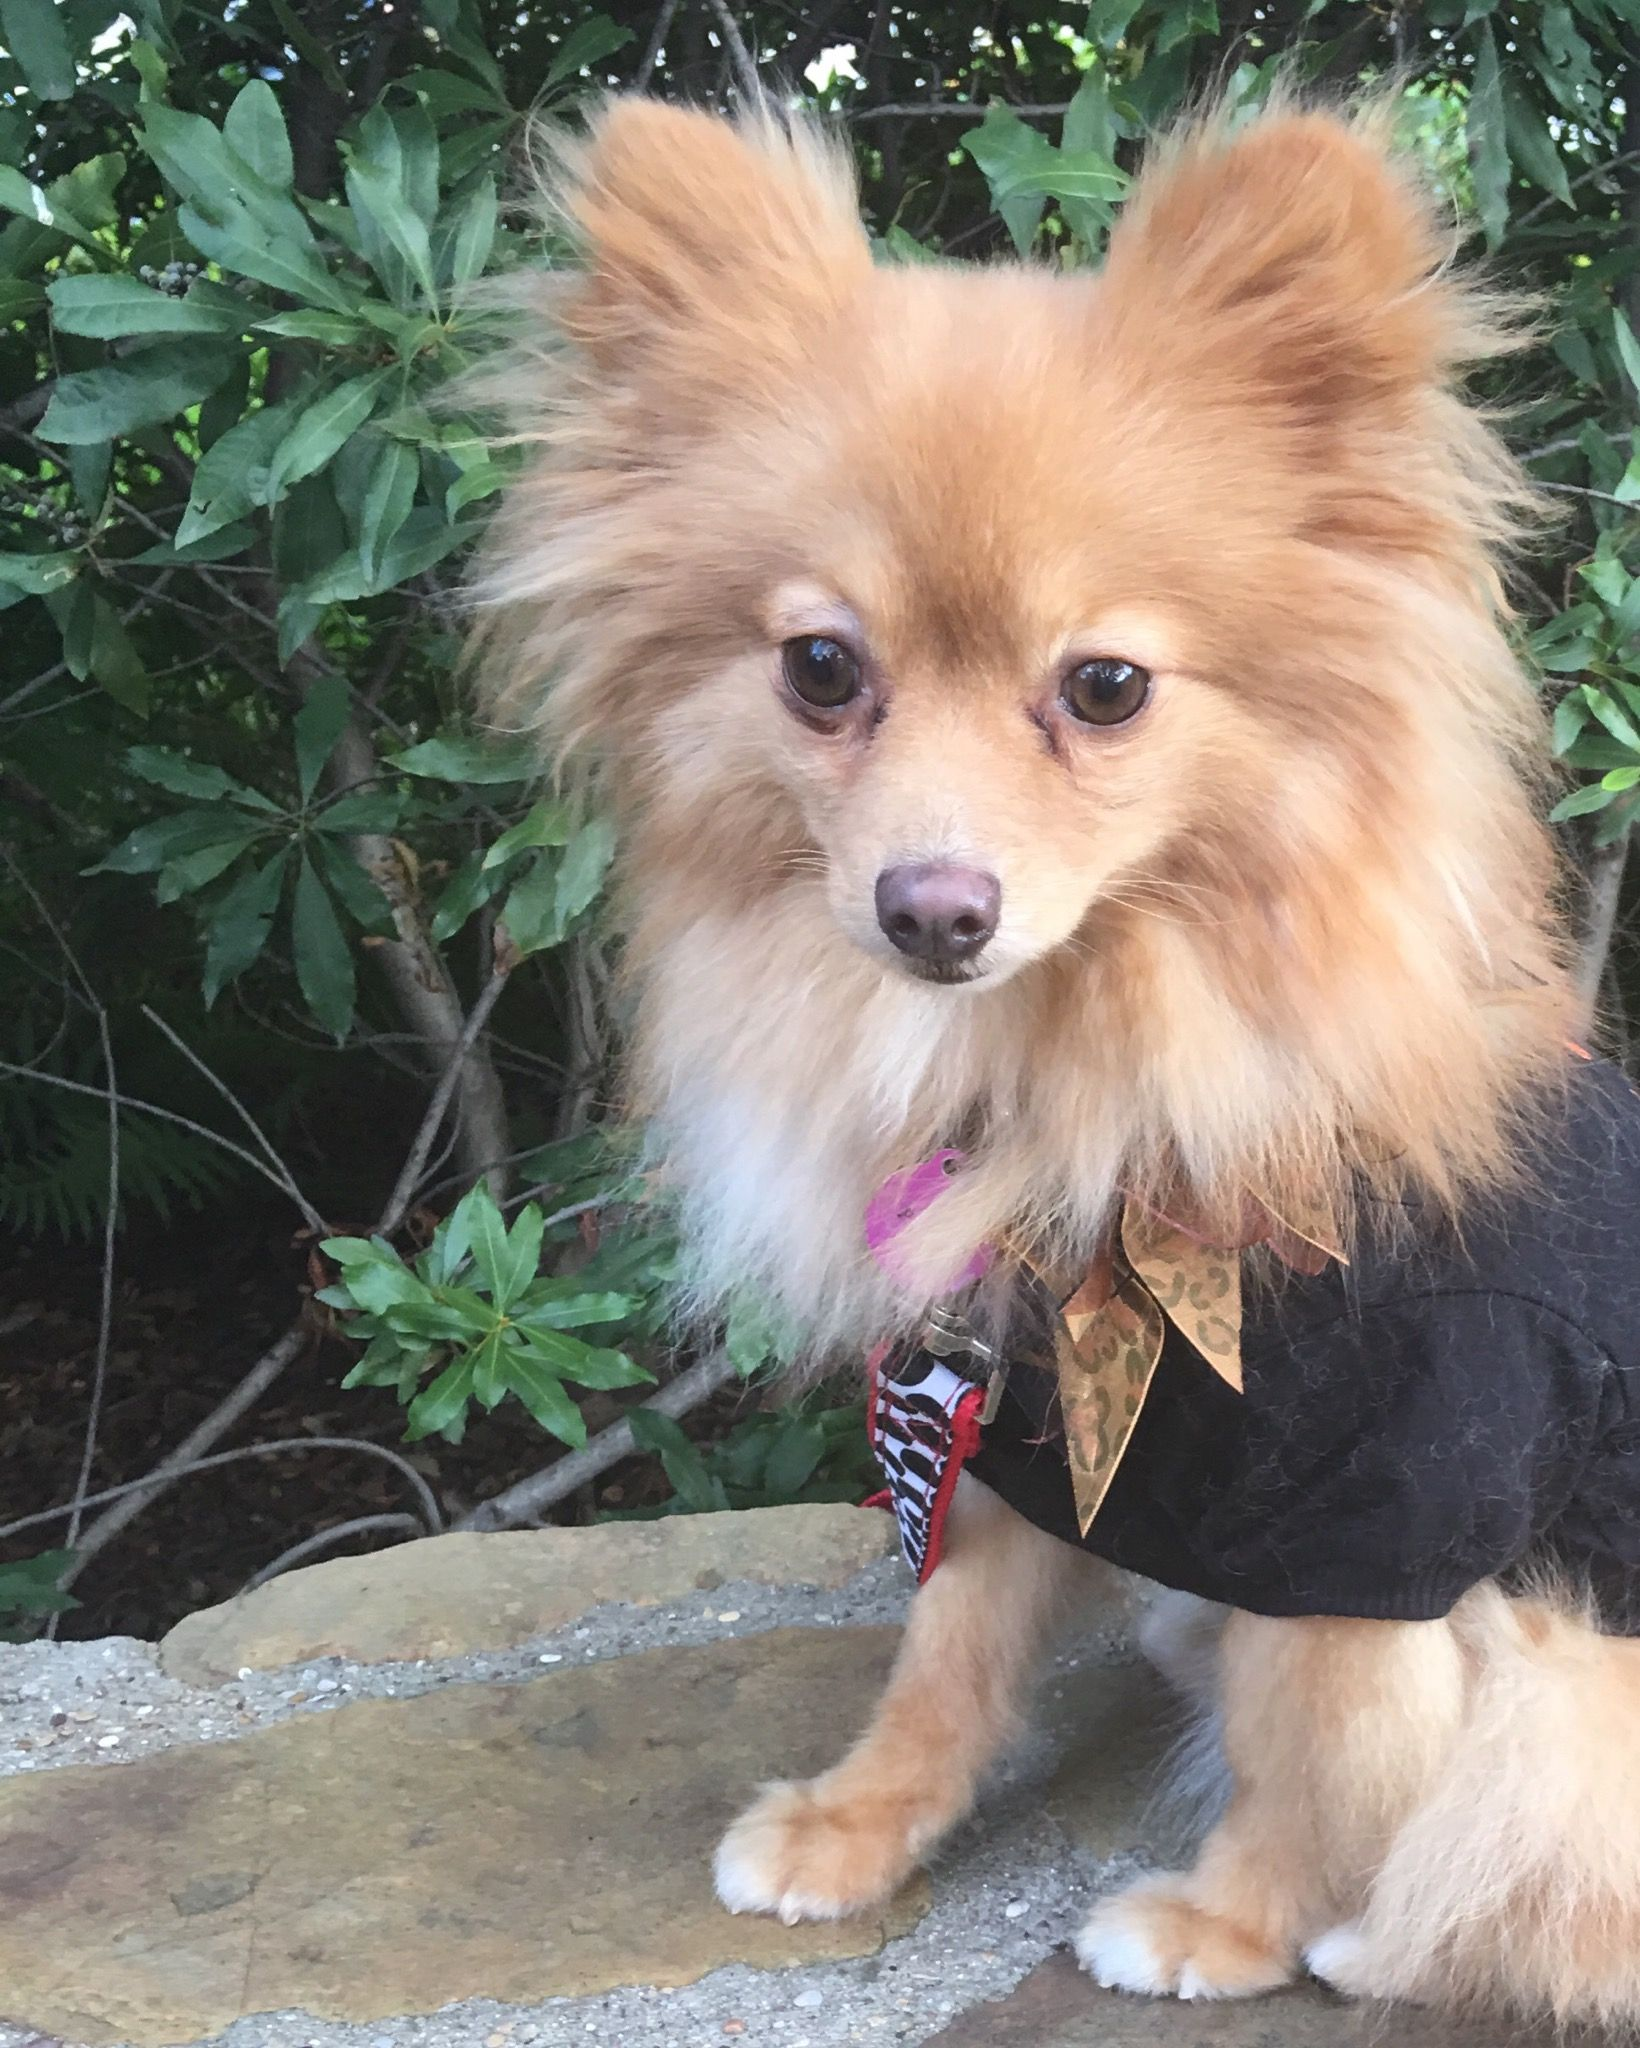 Pomeranian Dog For Adoption In Garland Tx Adn 714408 On Puppyfinder Com Gender Male Age Young Pomeranian Dog Dog Adoption Dogs